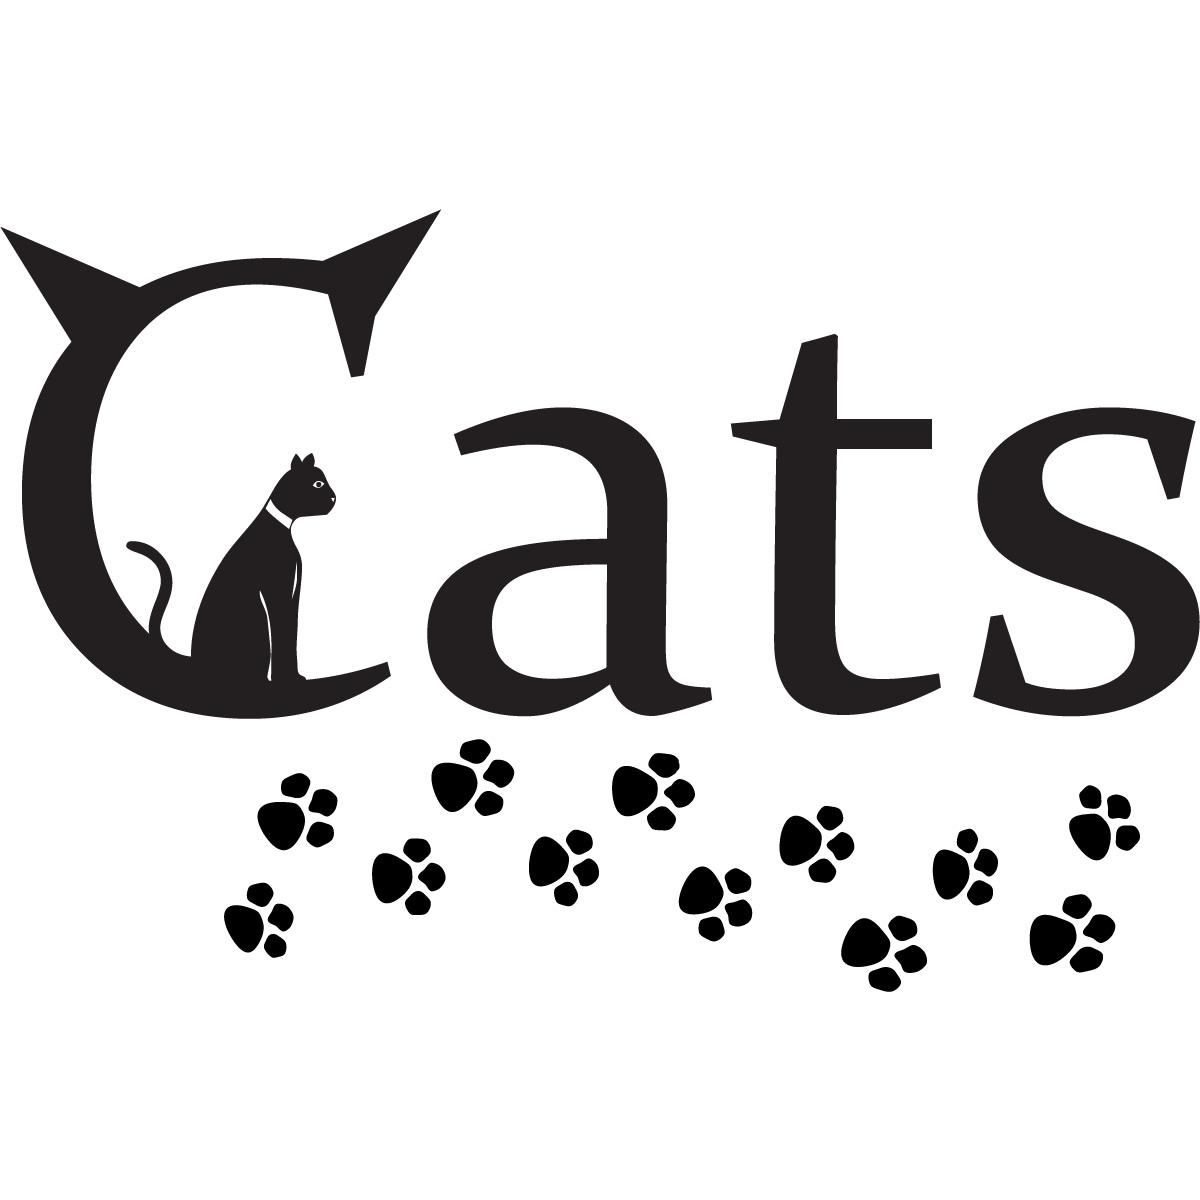 Free Cat Paw Prints Download Free Clip Art Free Clip Art On